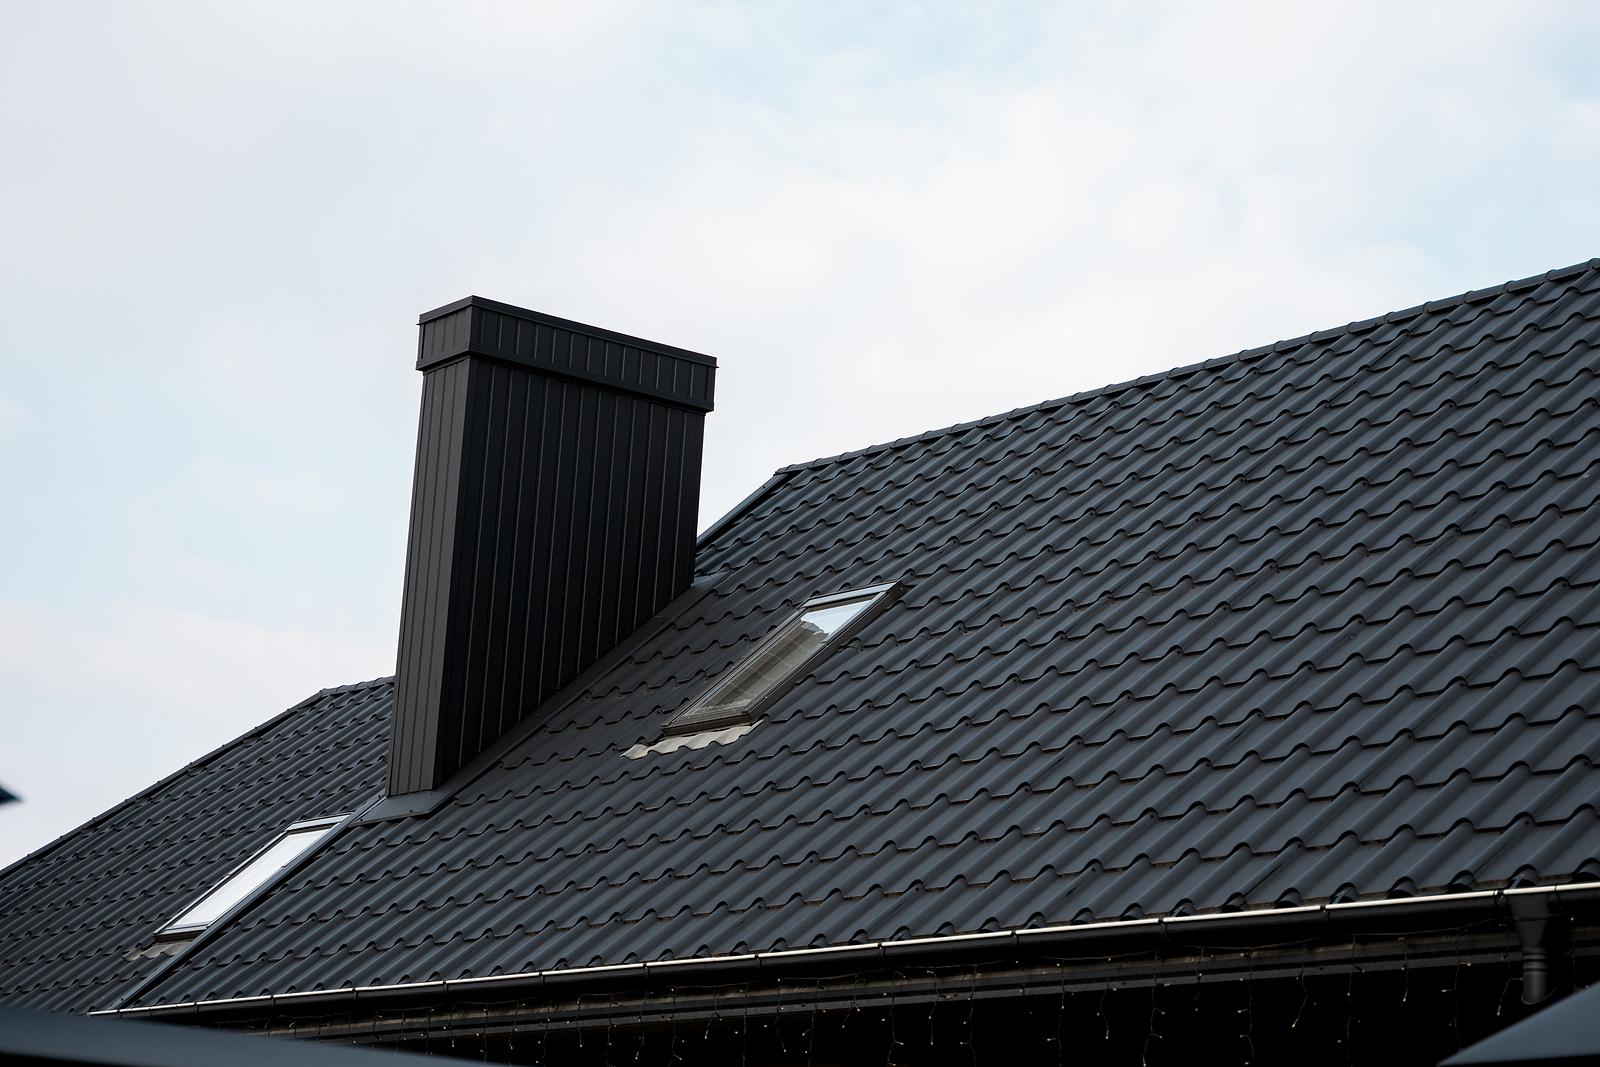 Roof Repair & Replacement Services Allen, TX